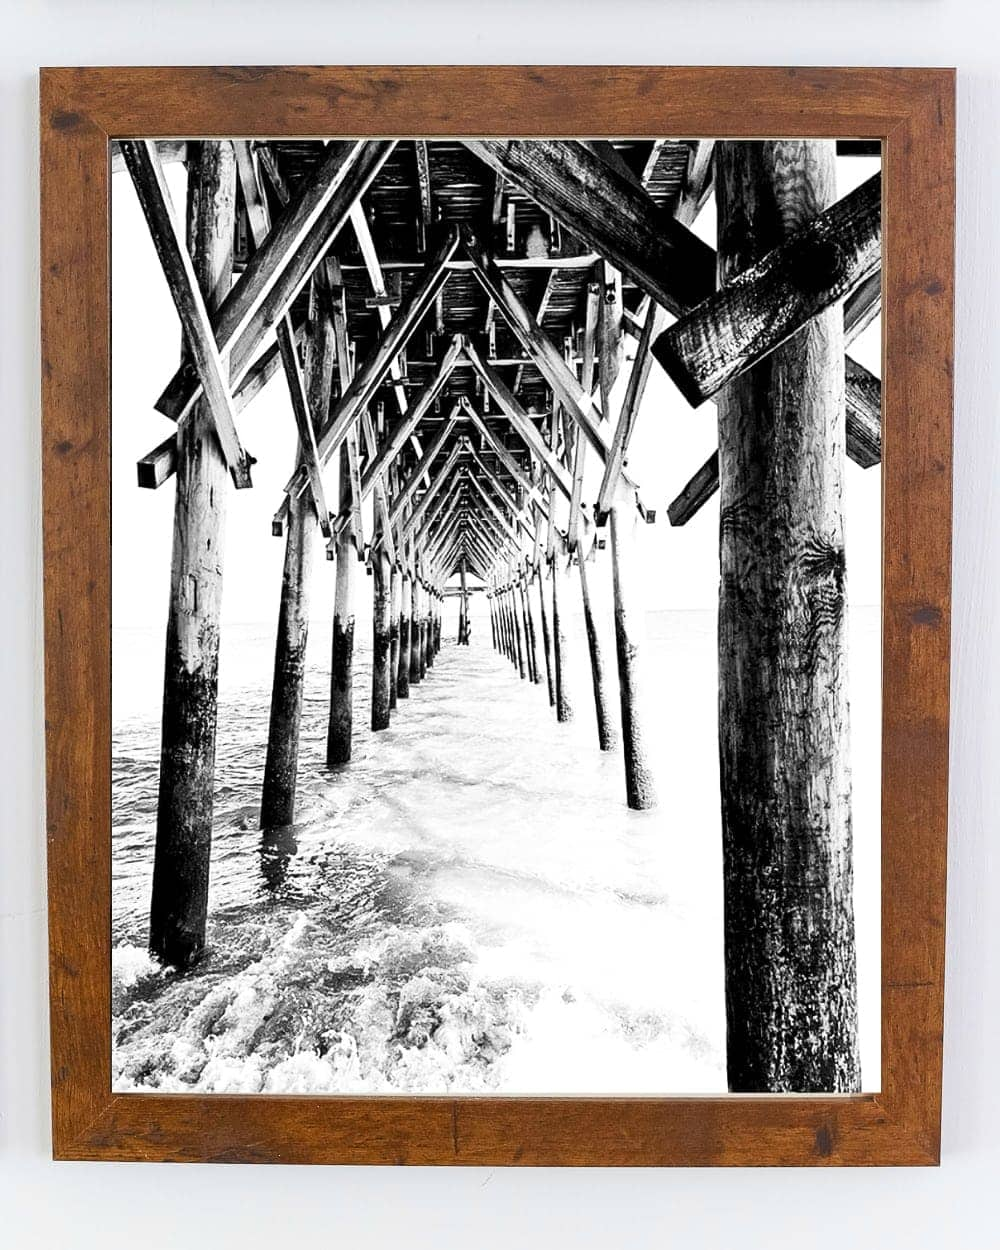 Free Carolina coastal art printable set featuring the Myrtle Beach boardwalk